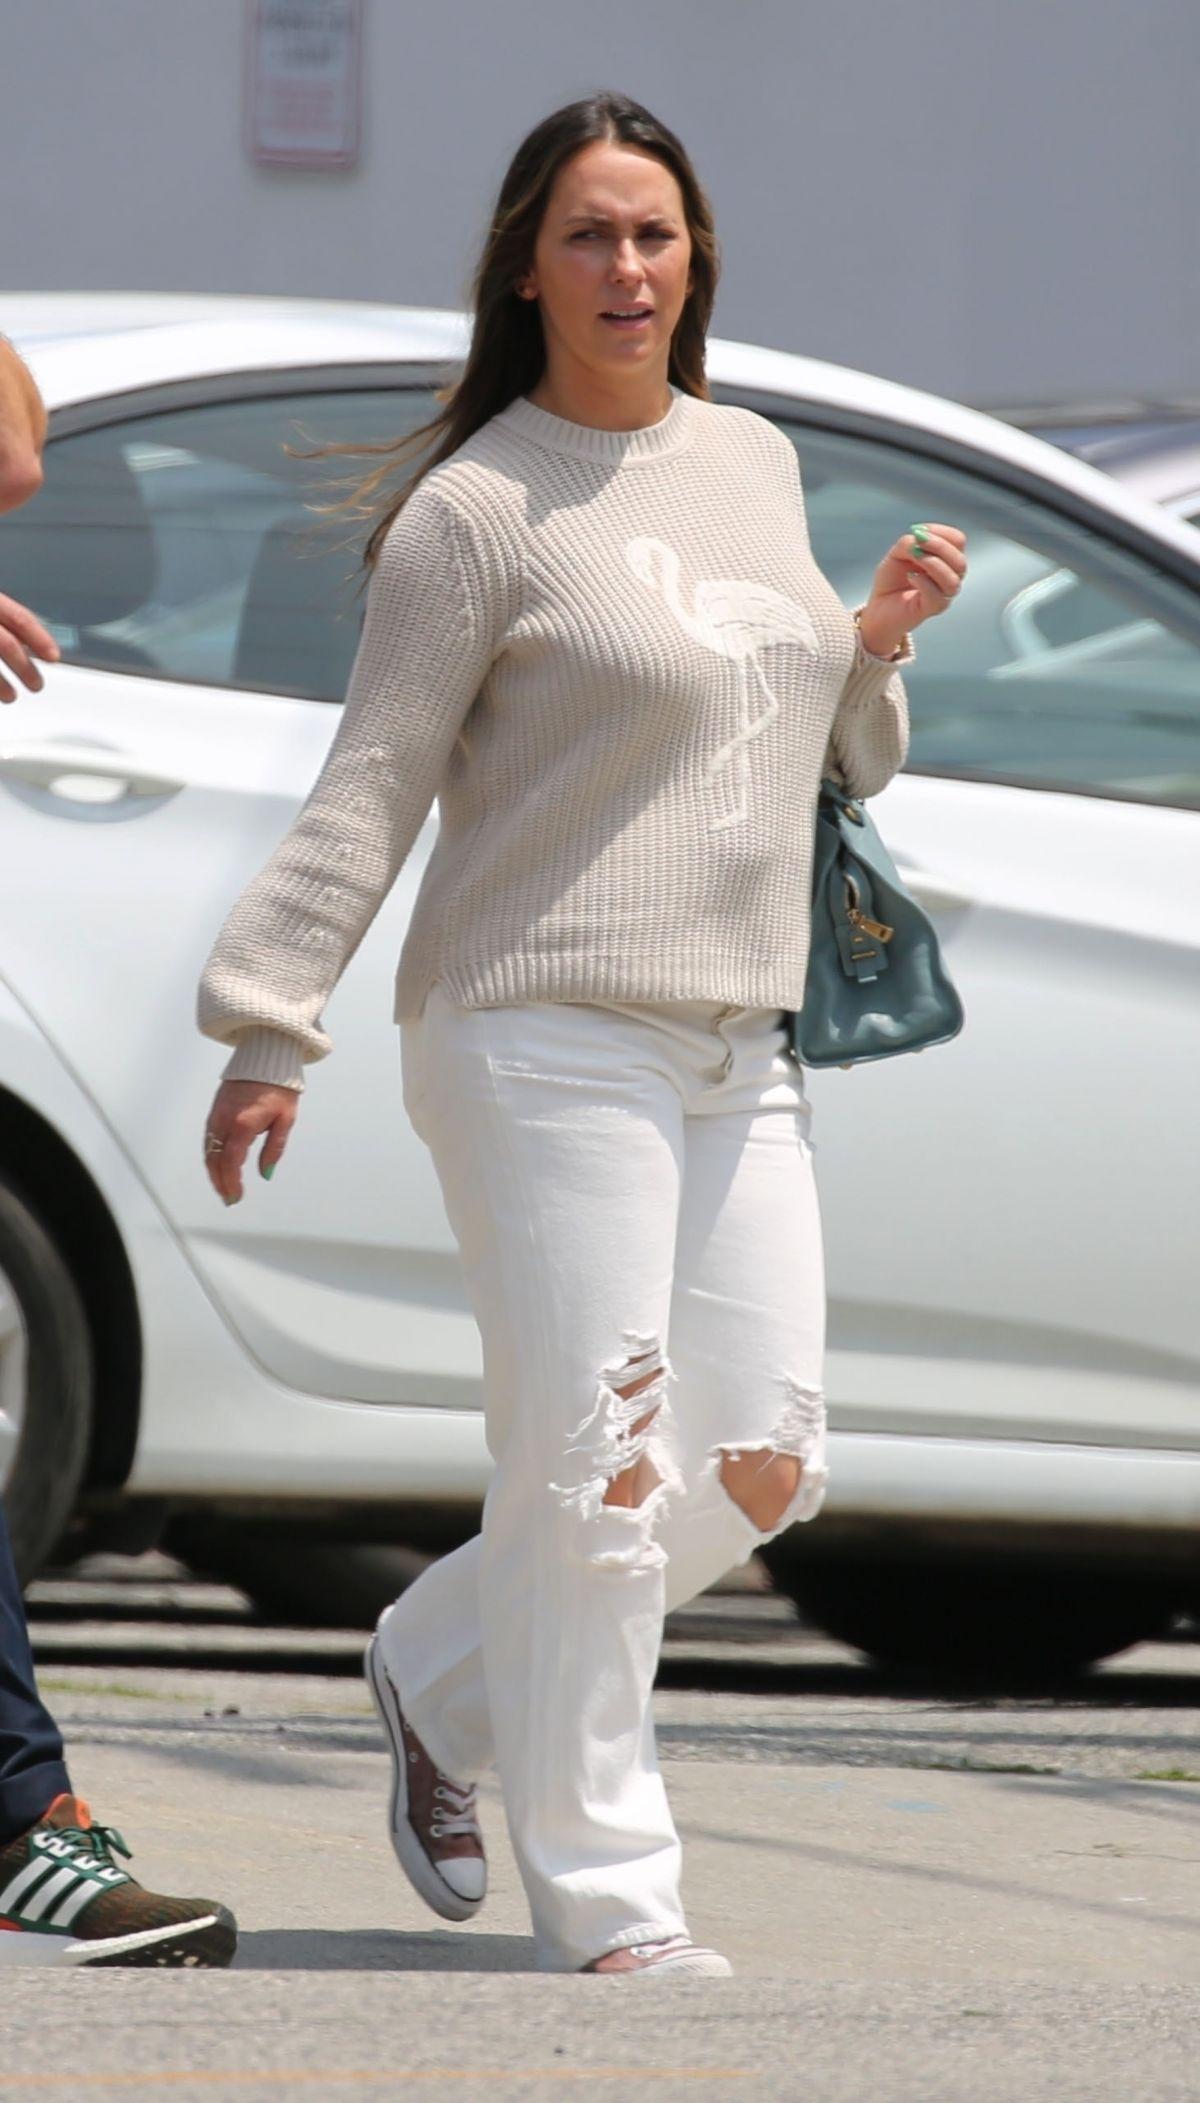 Jennifer Love Hewitt Fappening photo 6